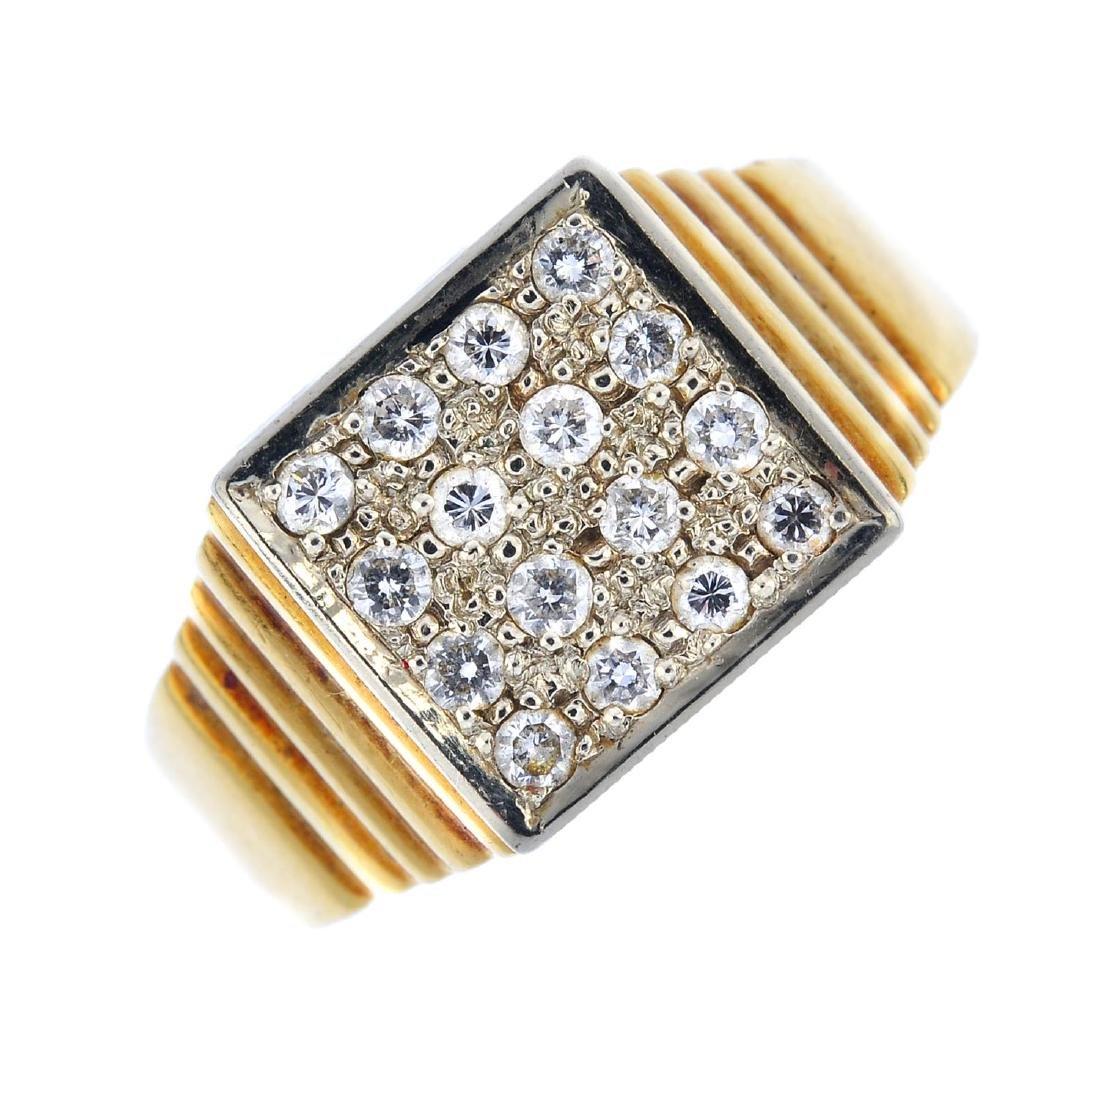 A gentleman's diamond signet ring. The pave-set diamond